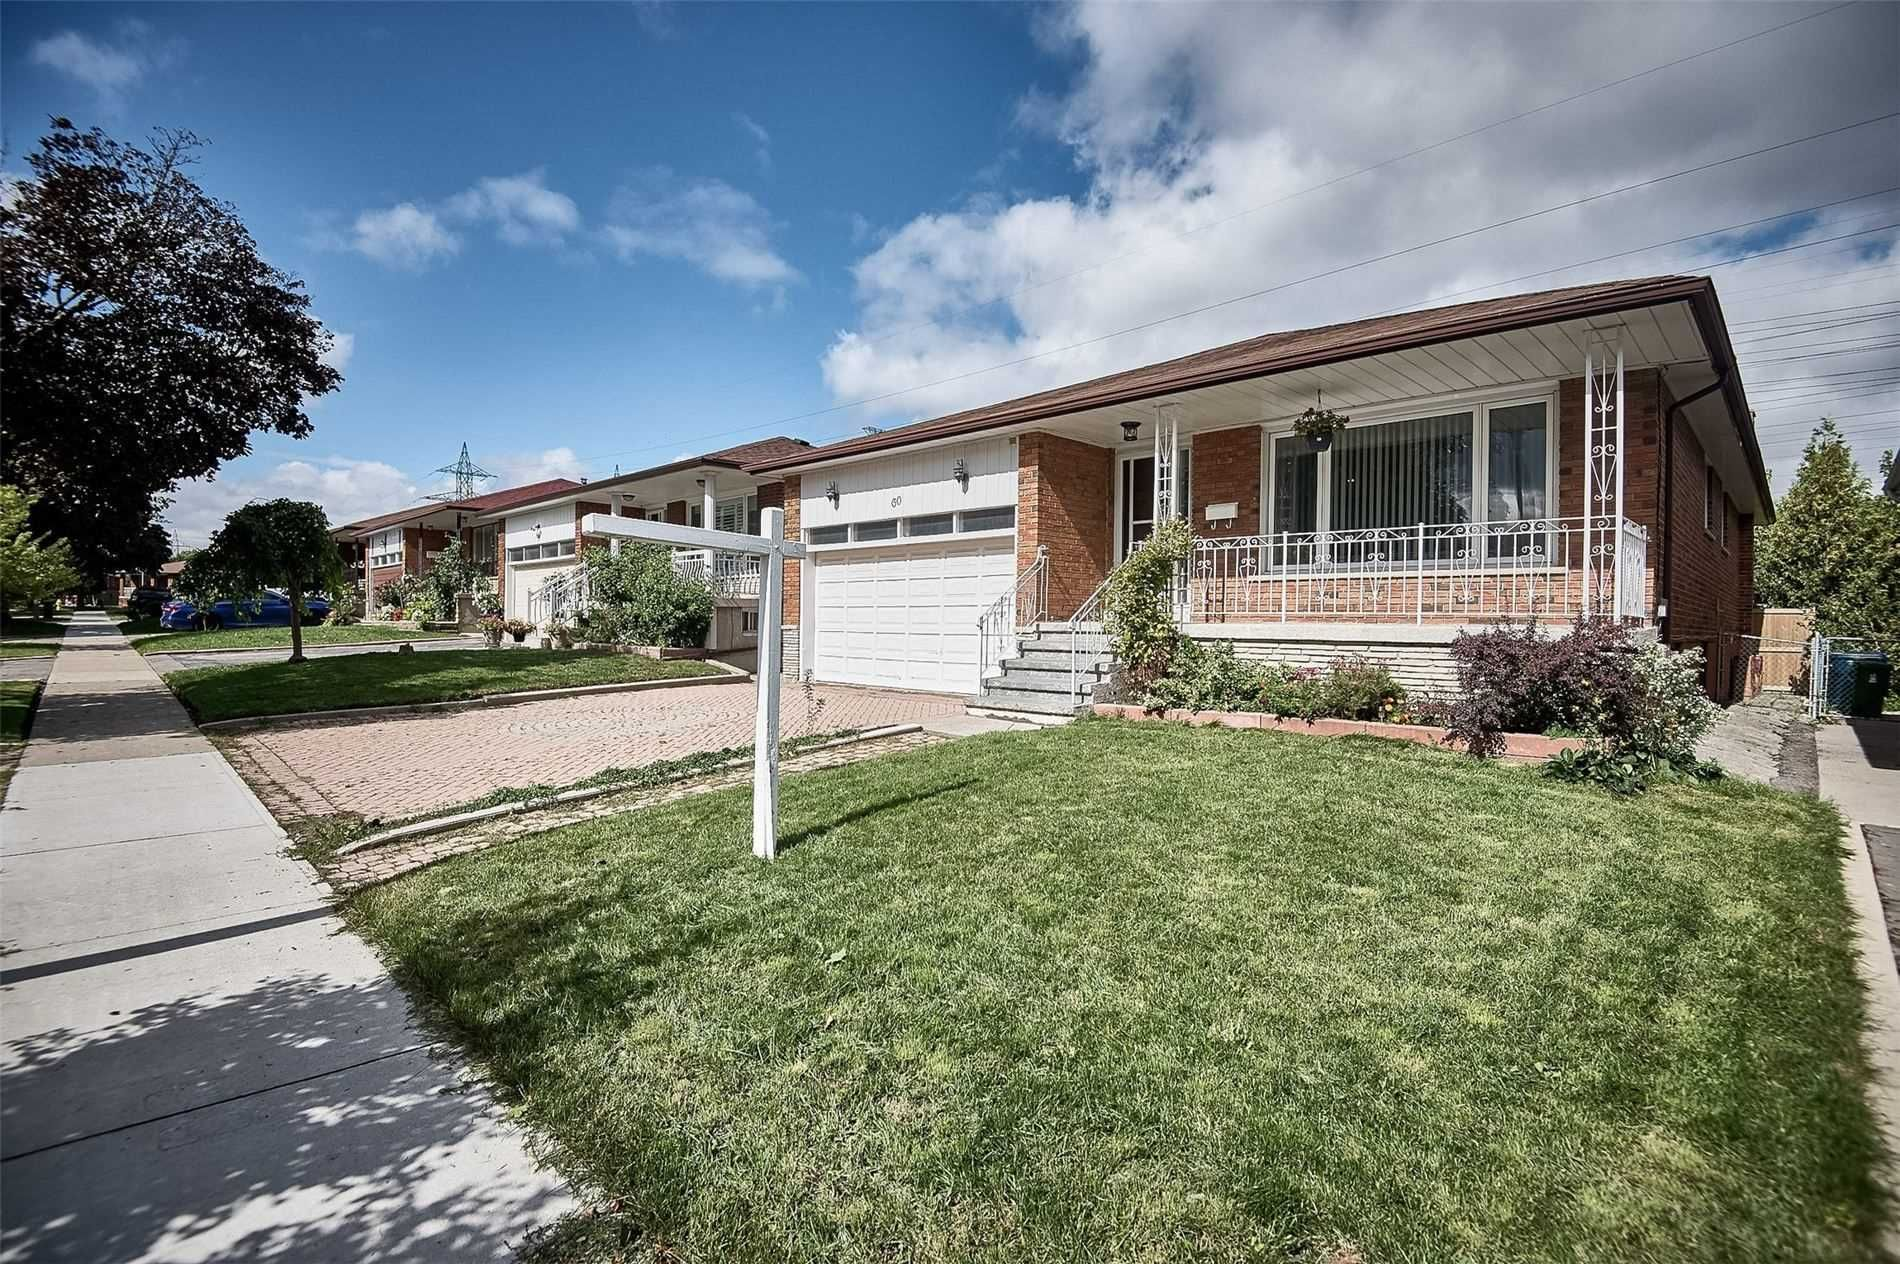 Main Photo: 60 Iangrove Terrace in Toronto: L'Amoreaux House (Bungalow) for sale (Toronto E05)  : MLS®# E5383921